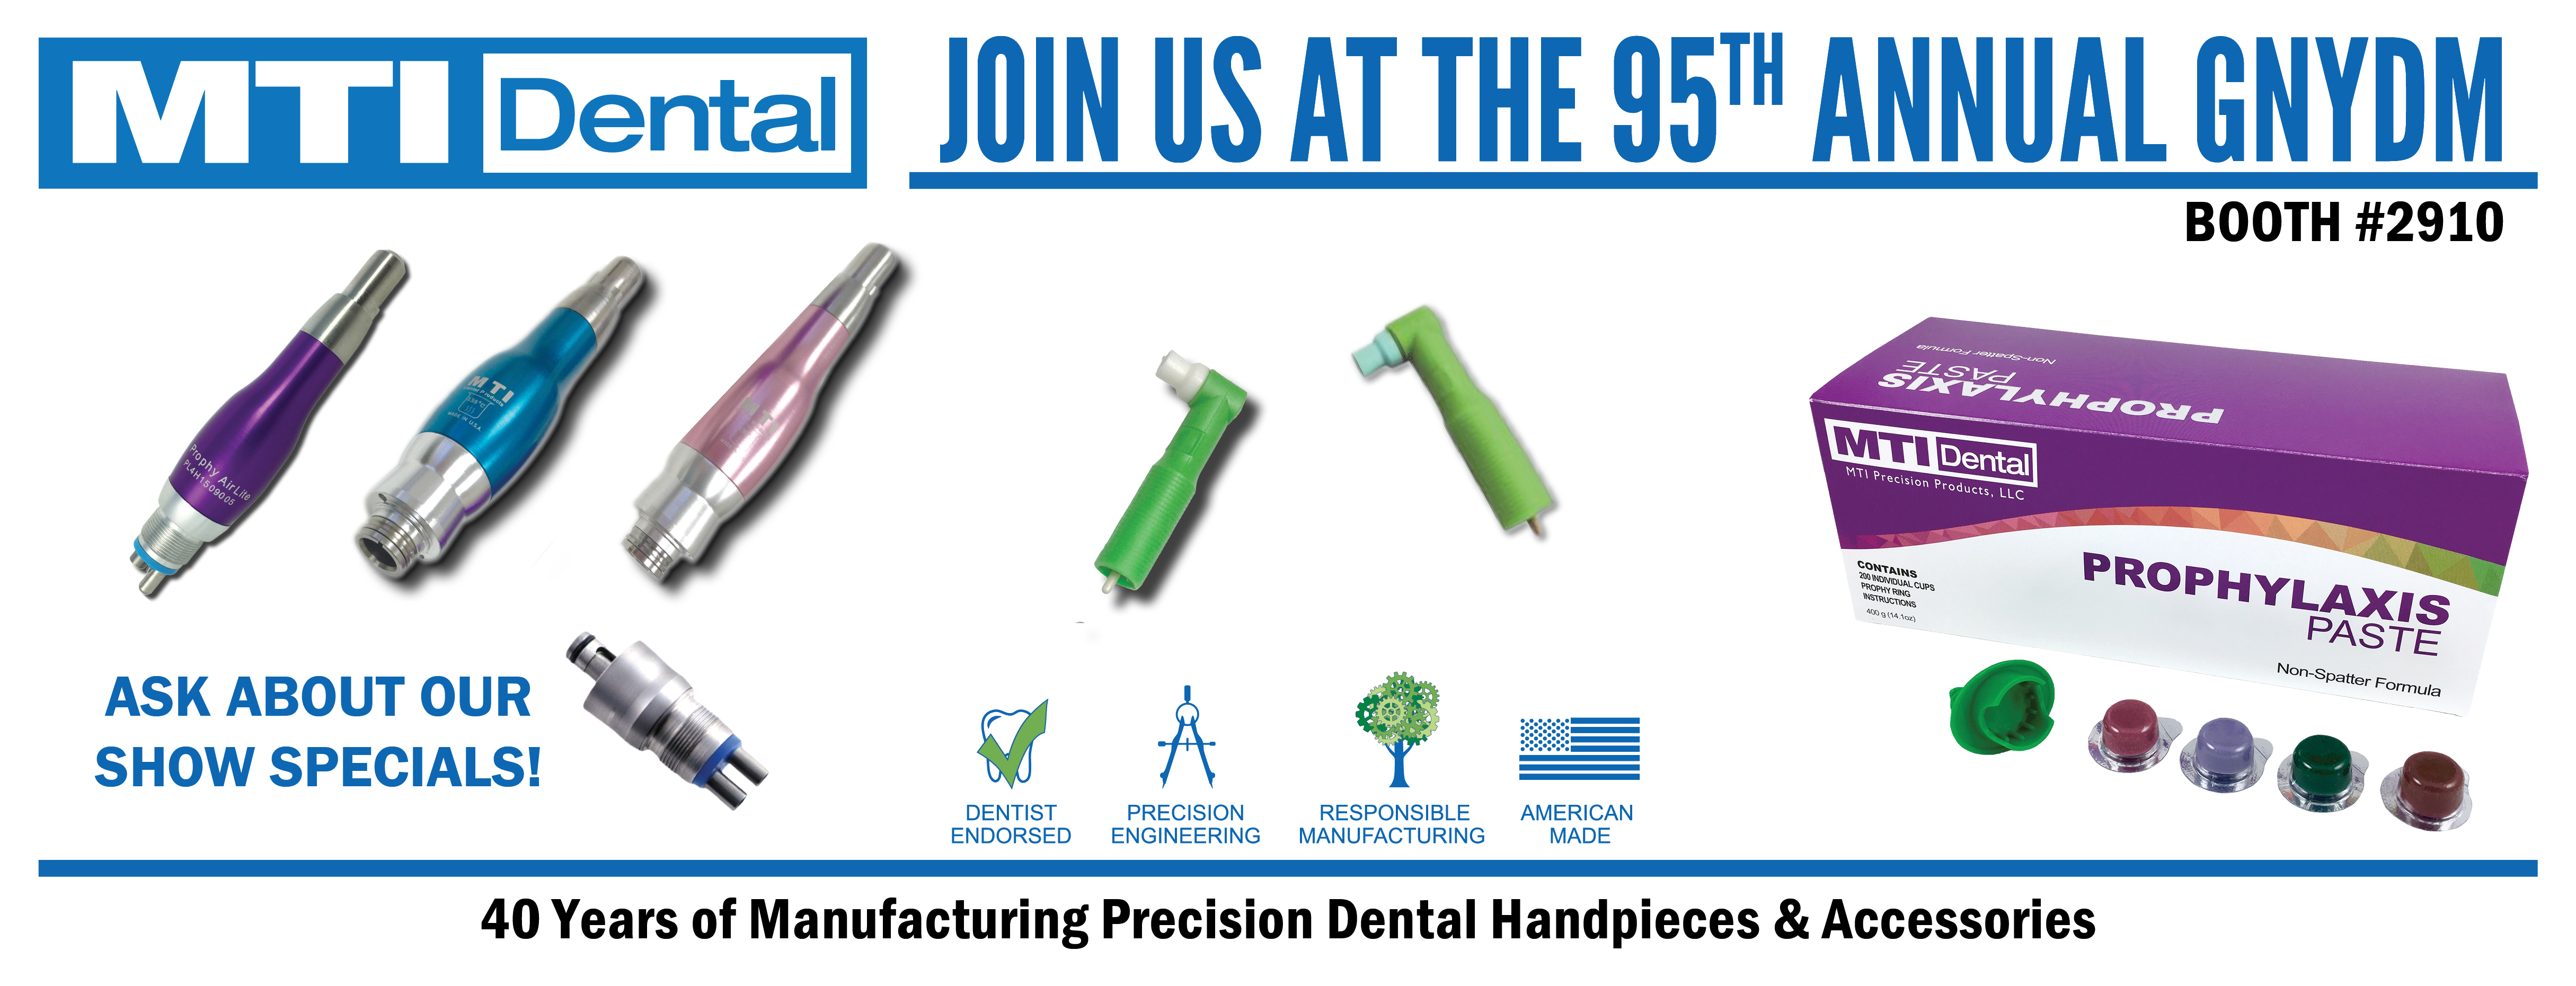 Meet the MTI Dental Team at the 2019 Greater New York Dental Meeting